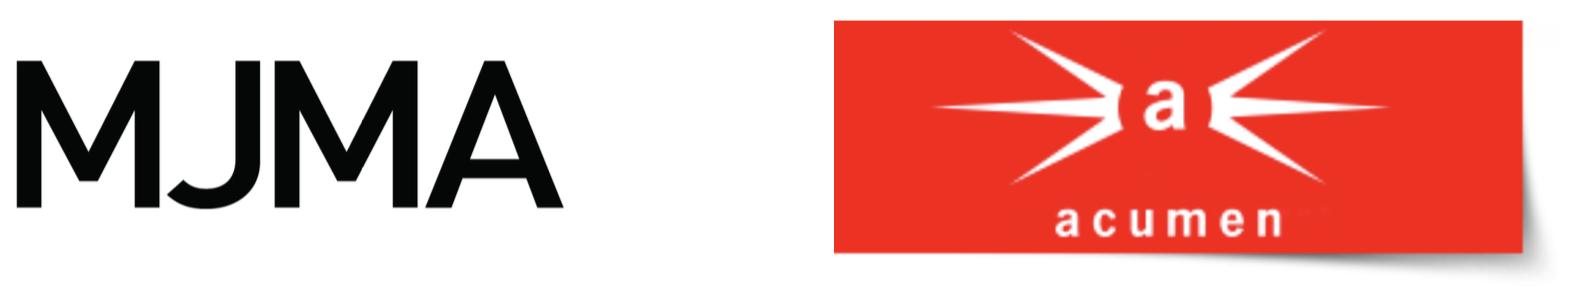 YYZ logos